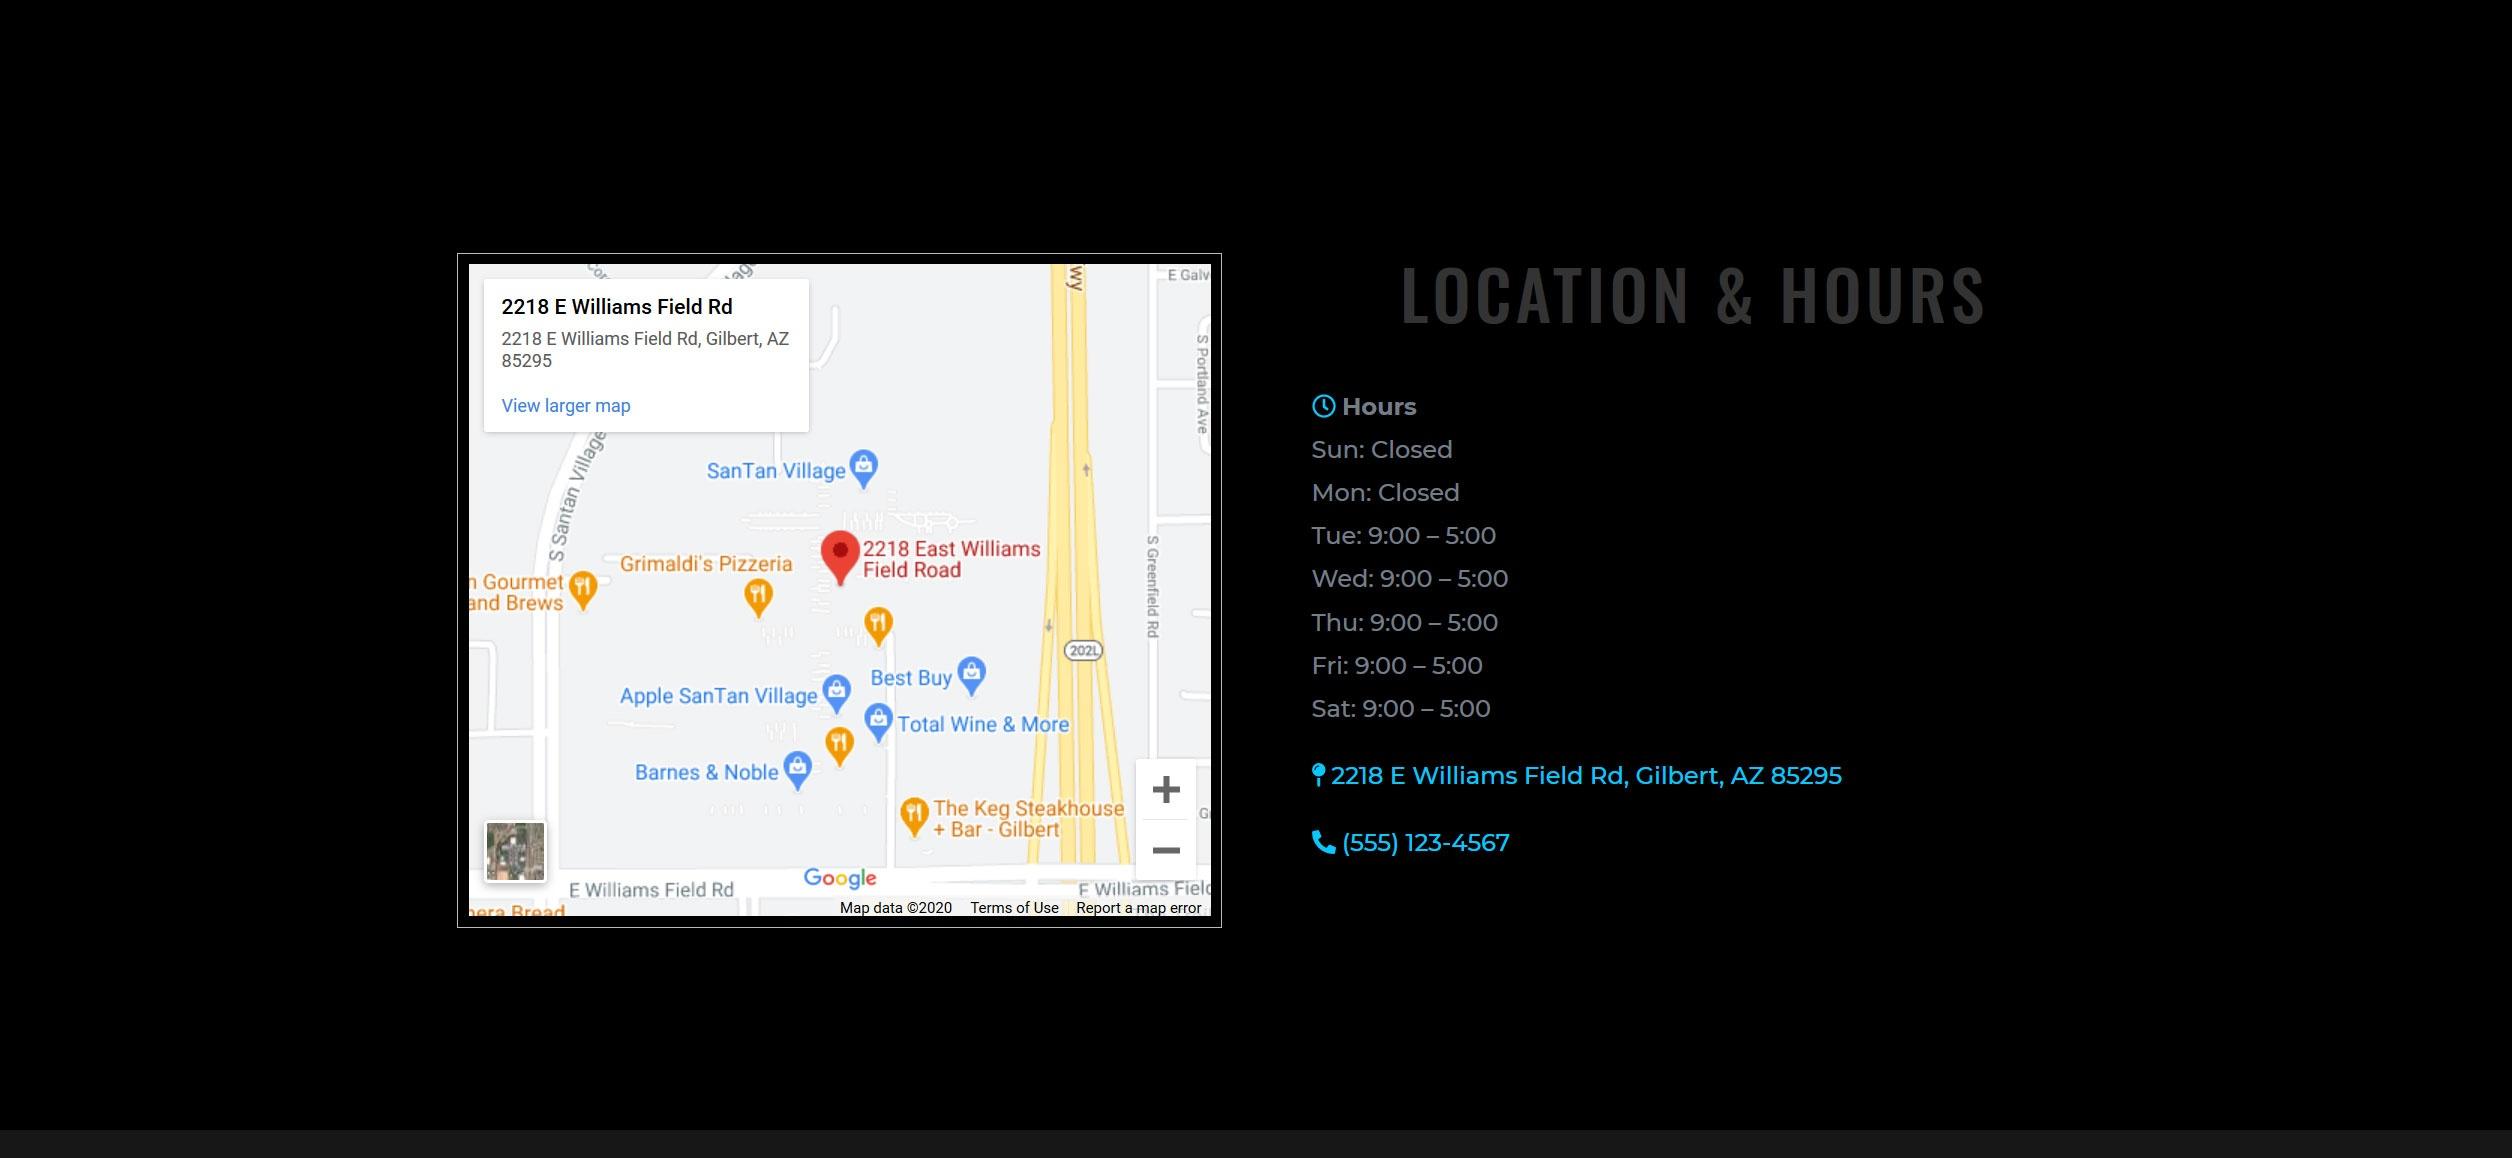 Website for Hair Braiding v1 - Location & Hours